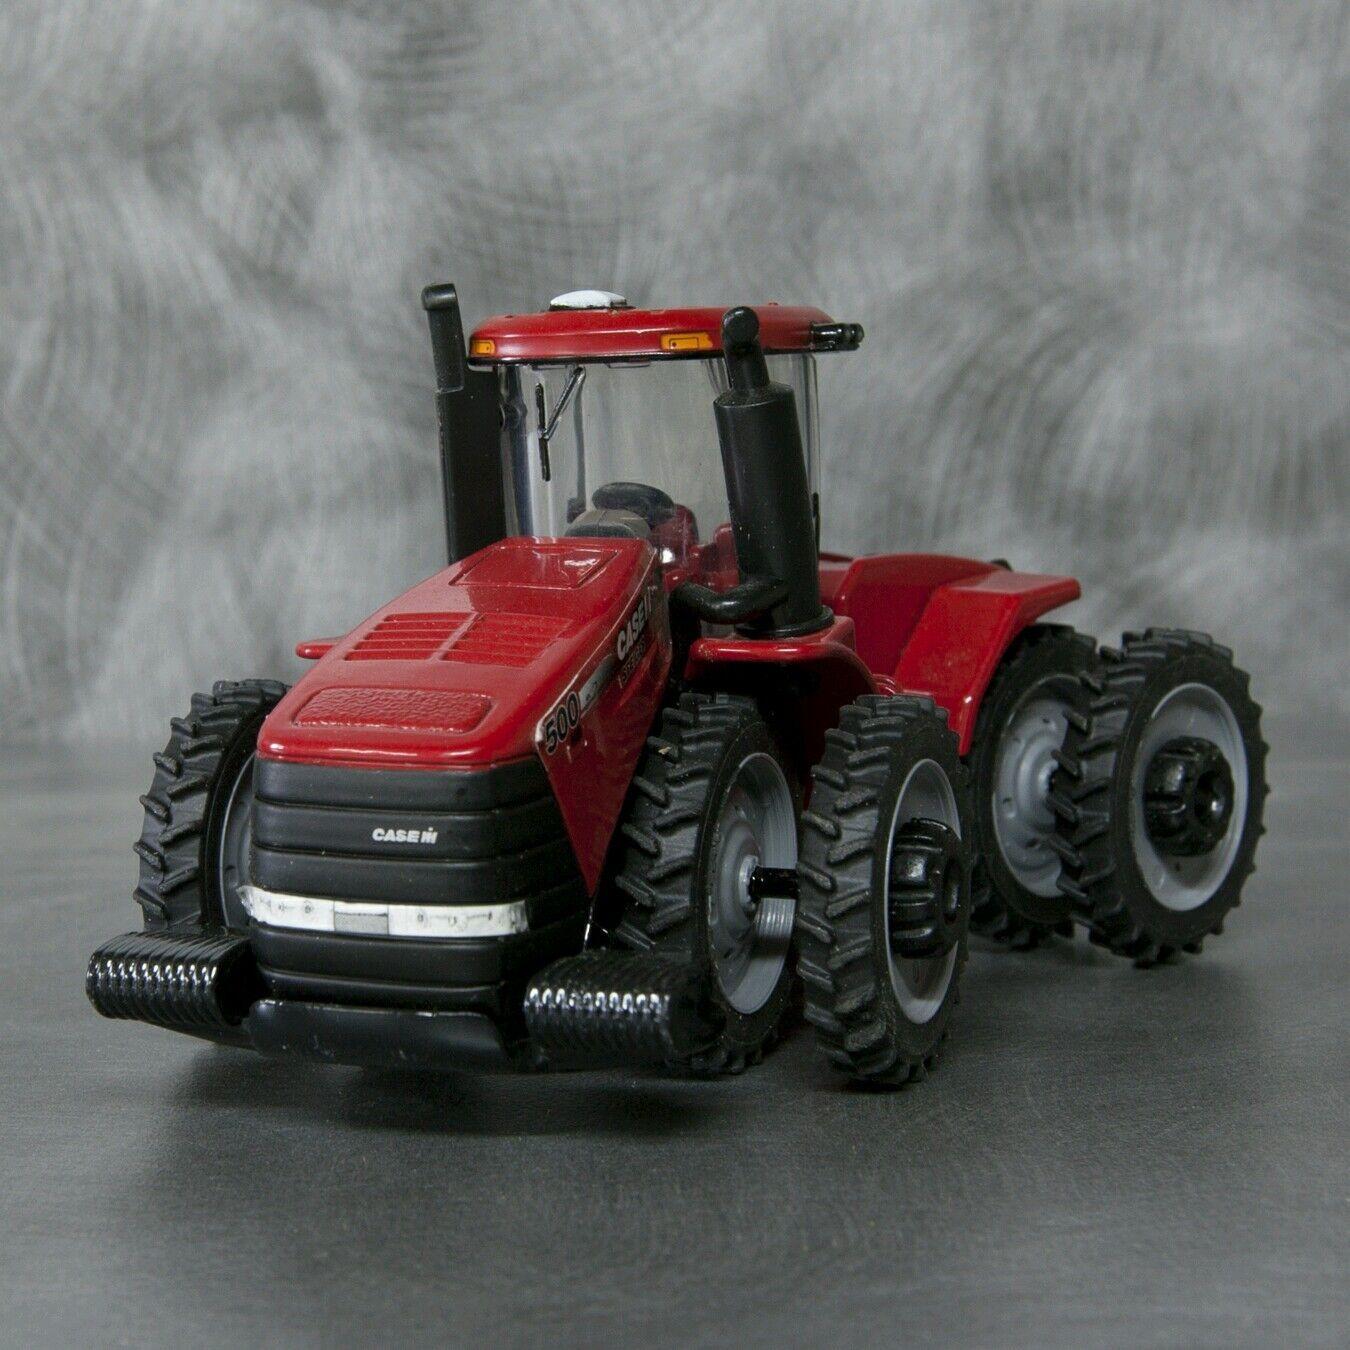 axels 1//64 Farm custom scratch 20.8 R46 tractor tire kit gray rims